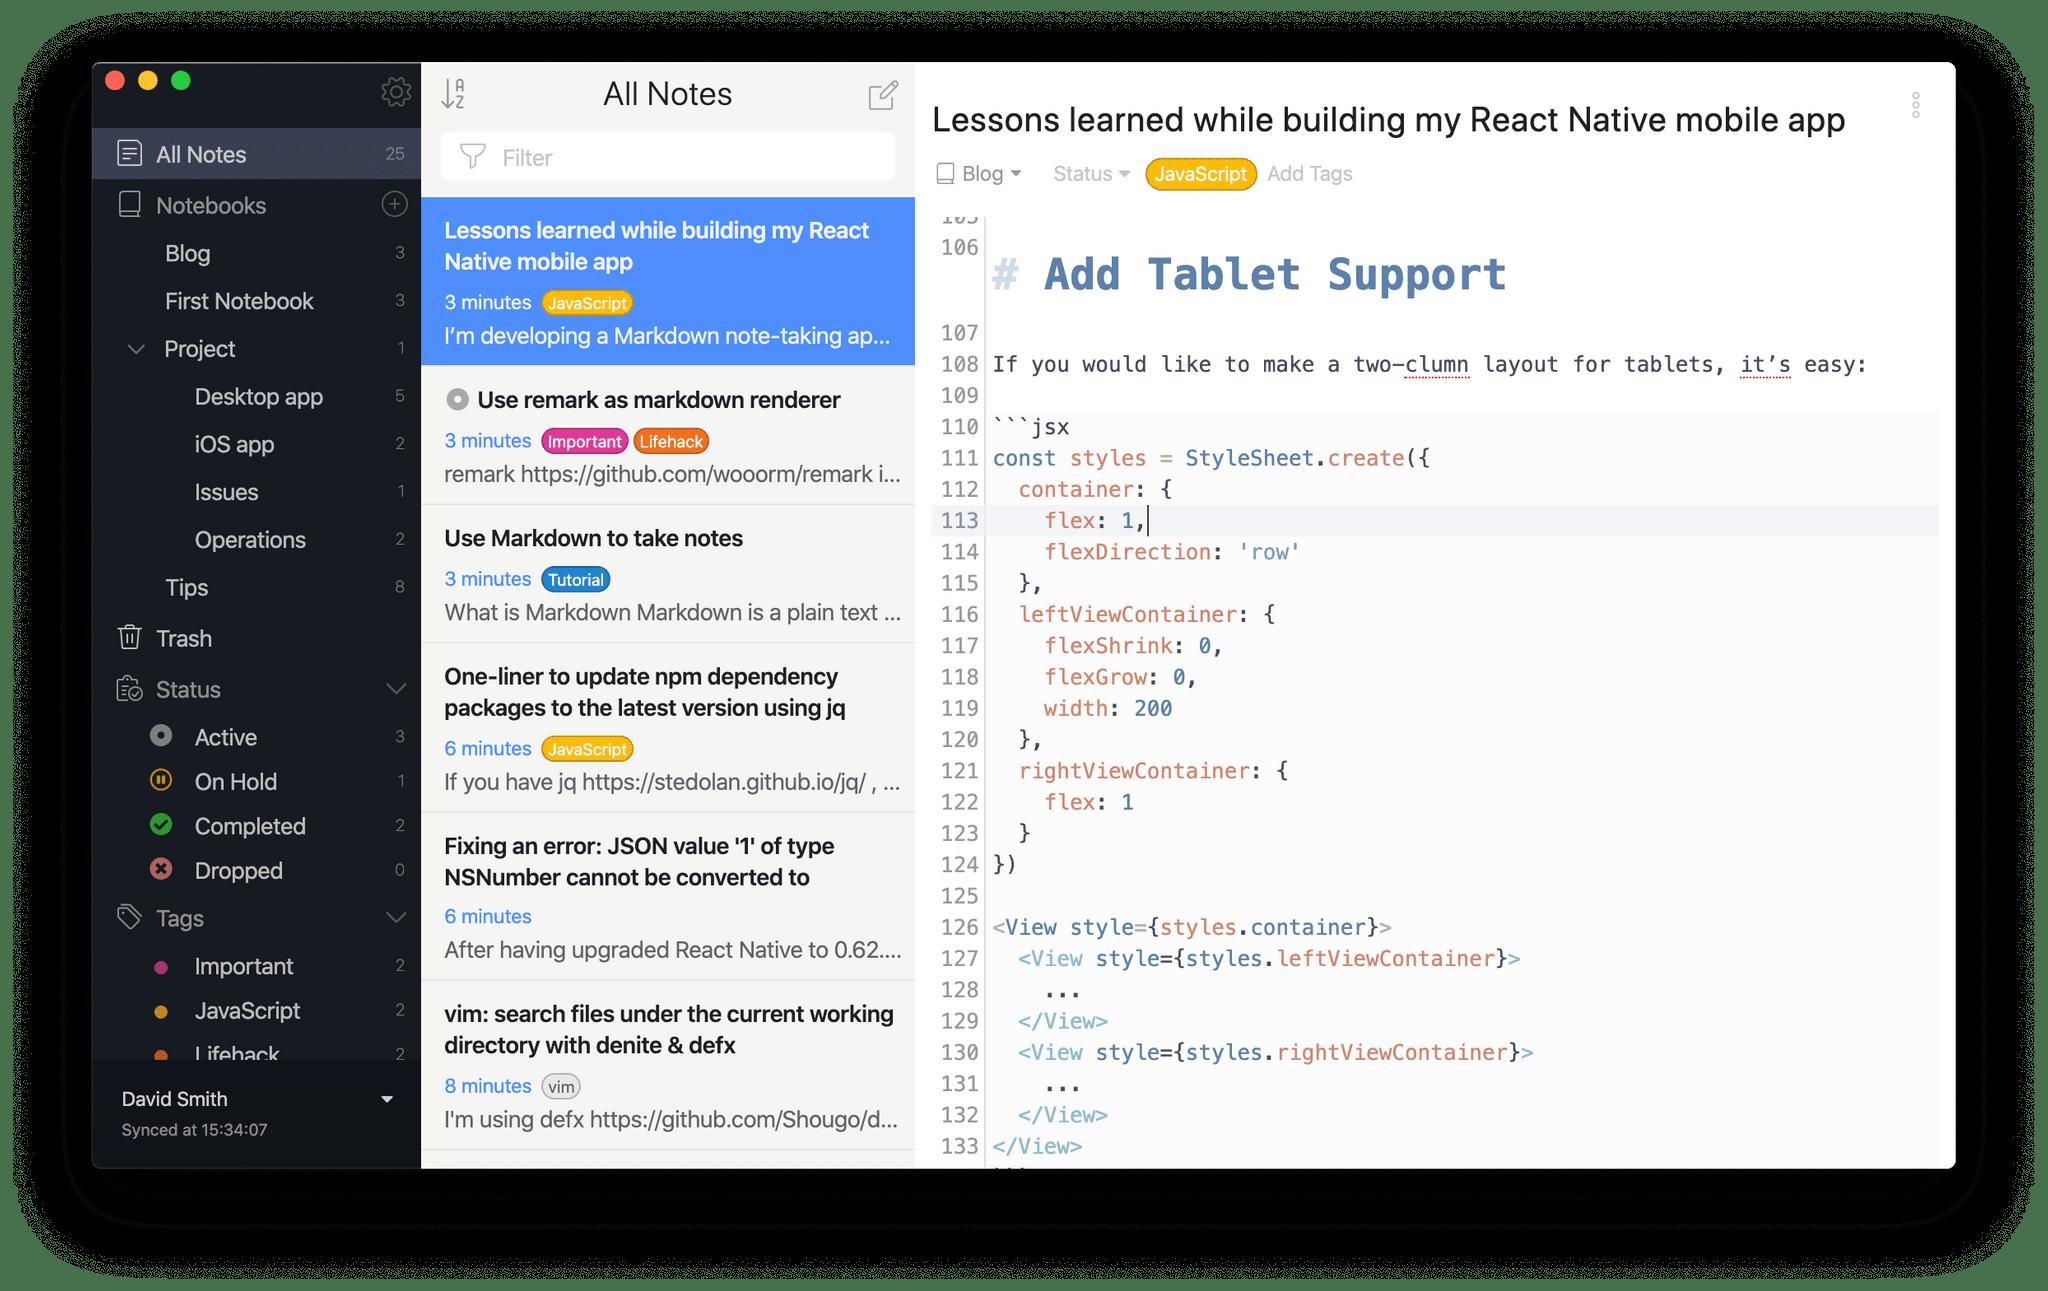 A screen shot of the Inkdrop editor